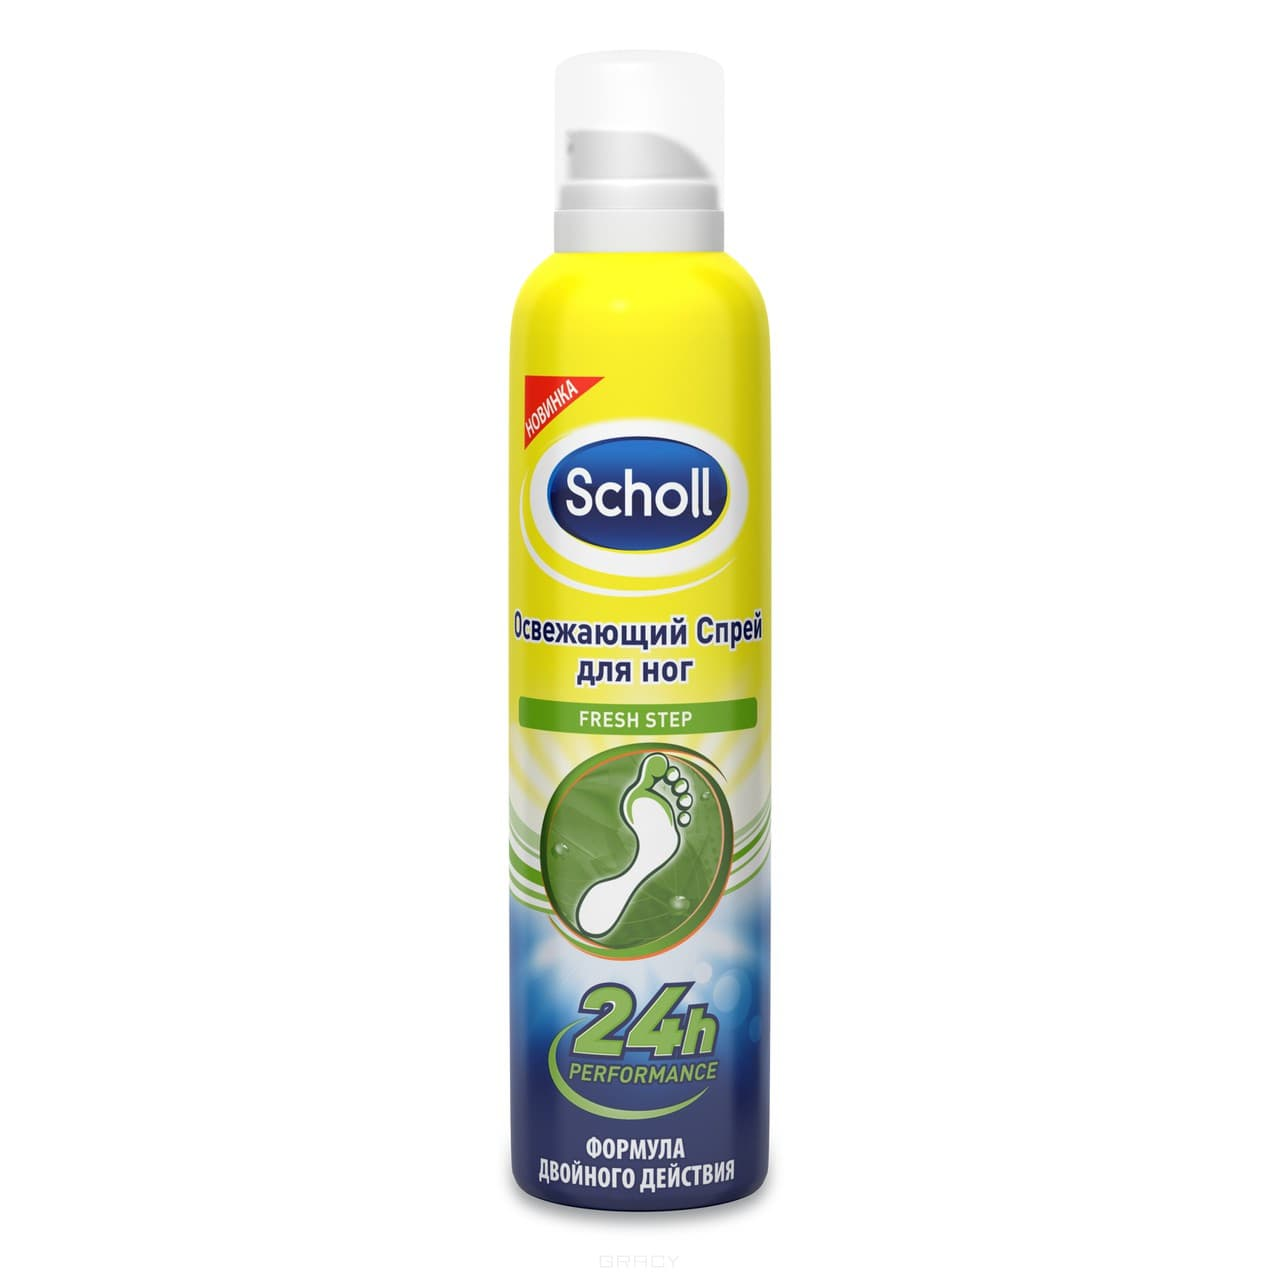 Scholl, Освежащий спрей дл ног активного действи, 150 млУход за ногами<br><br>